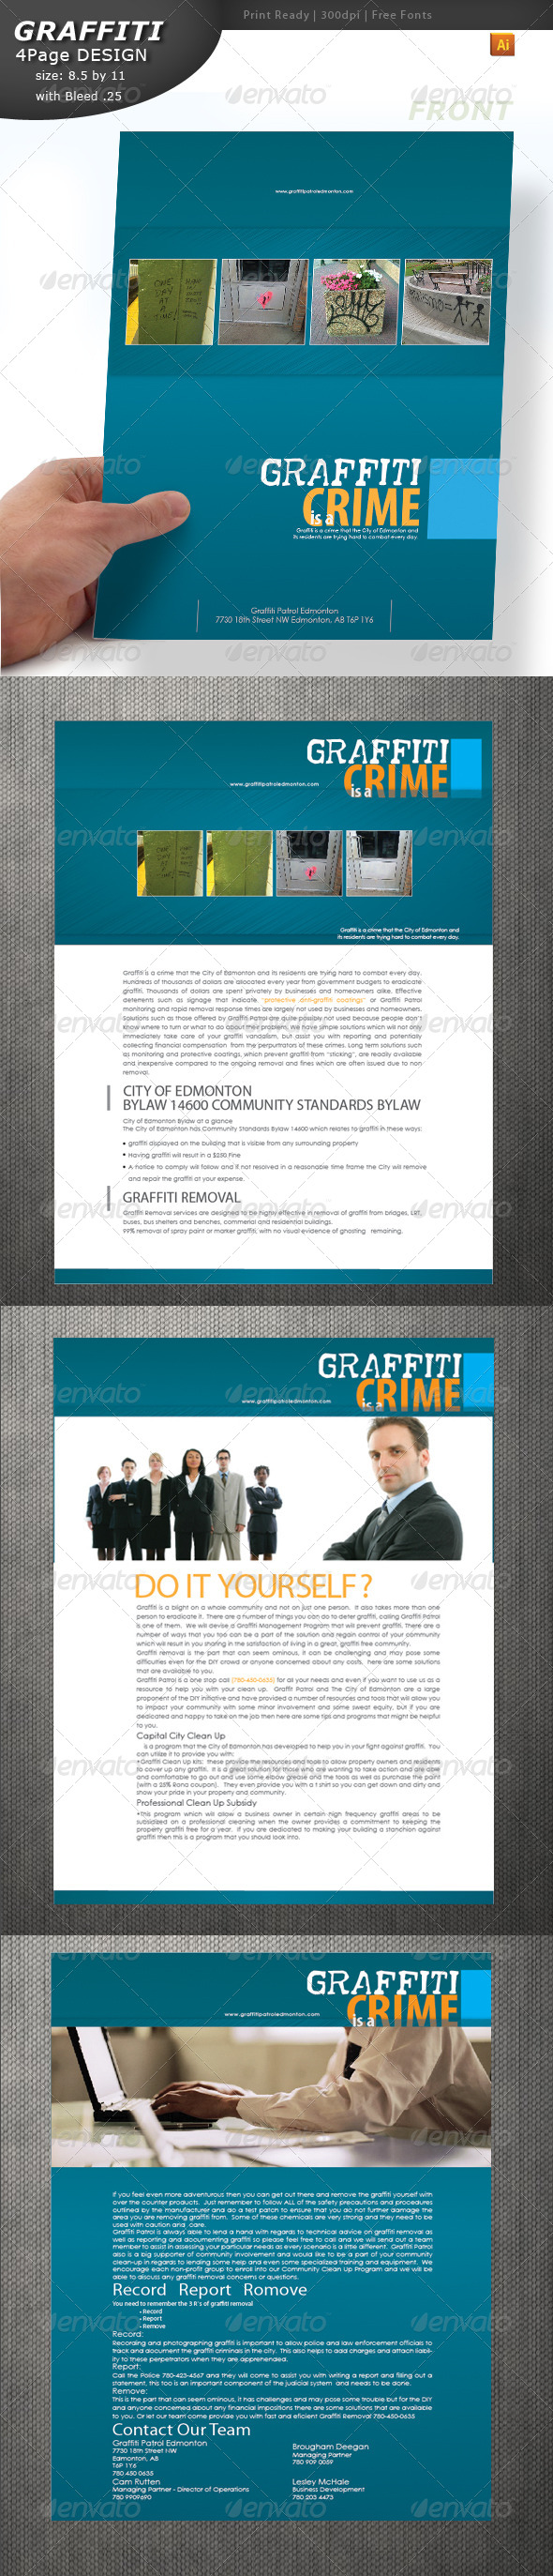 Graffiti Brochure - Brochures Print Templates